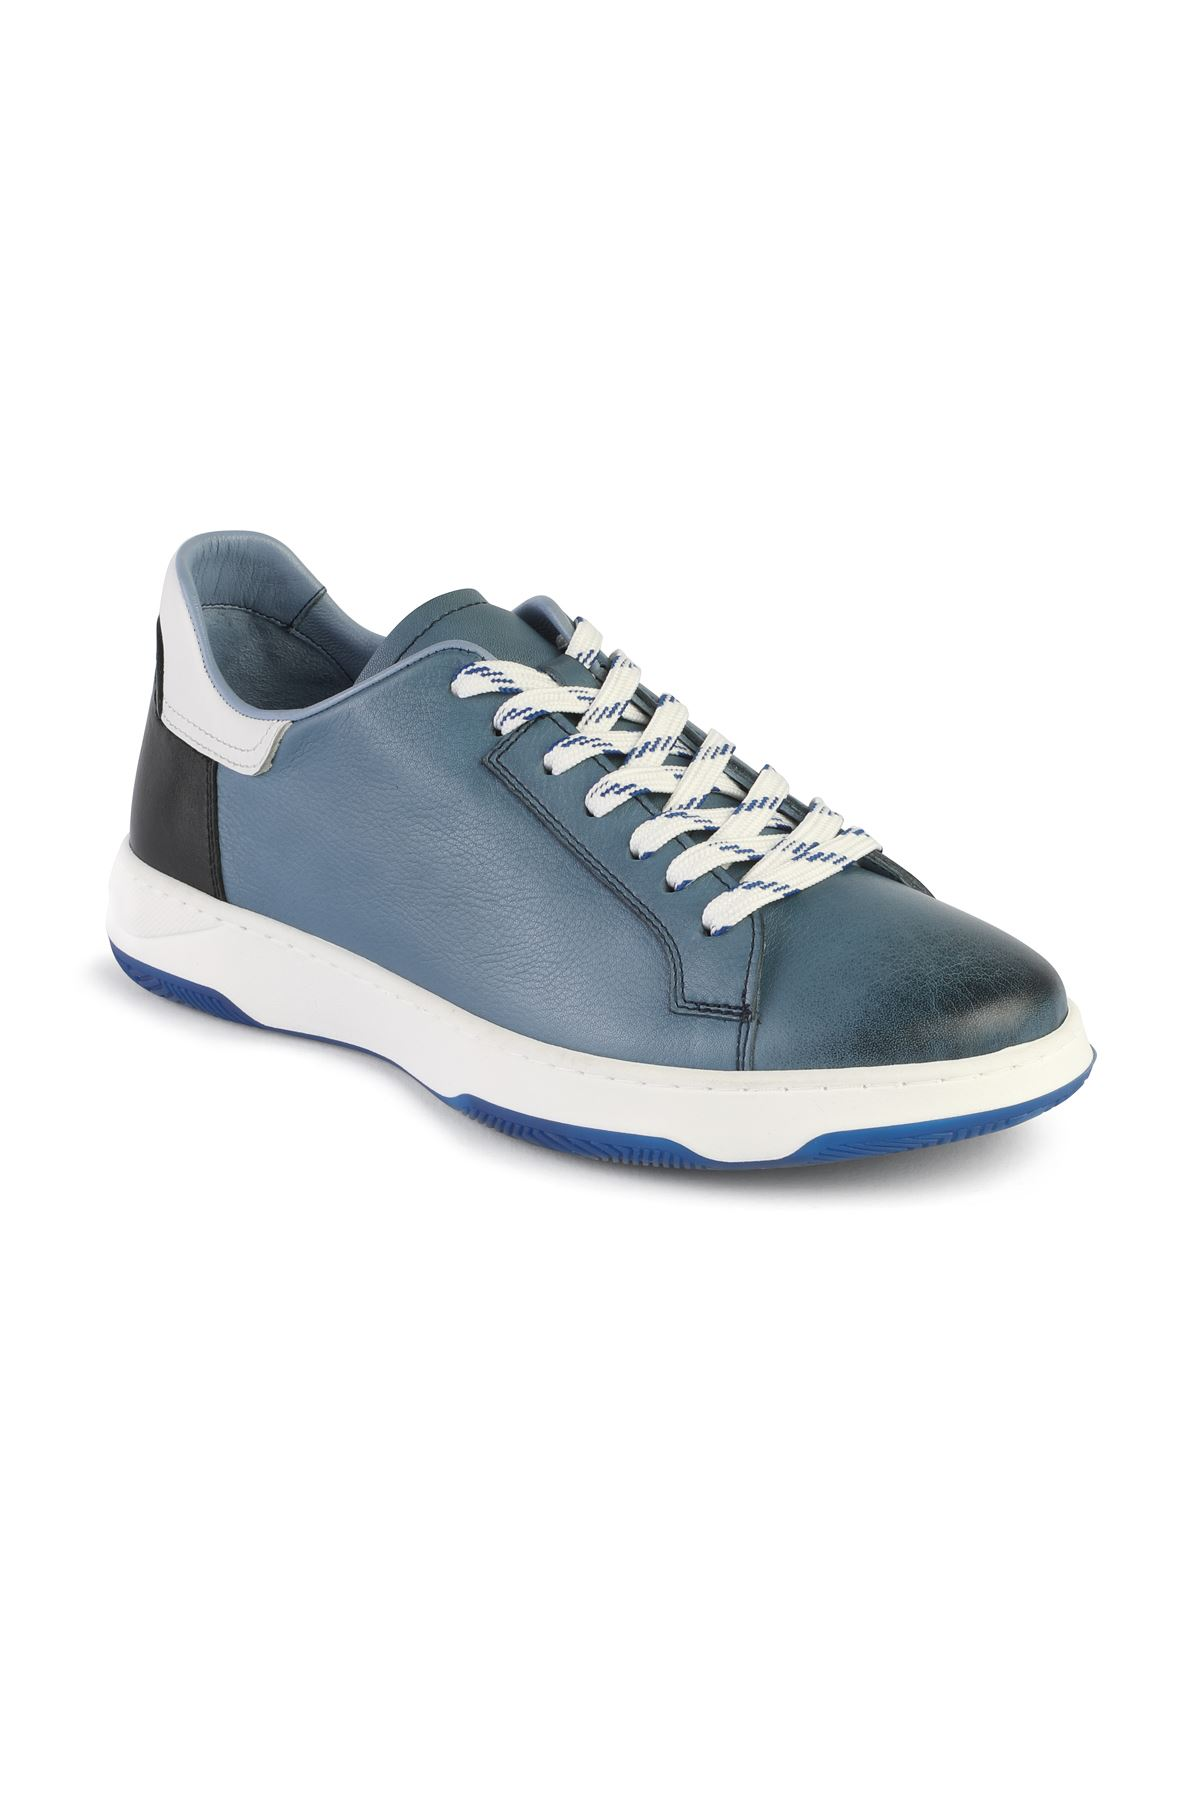 Libero L3227 Blue Sport Shoes